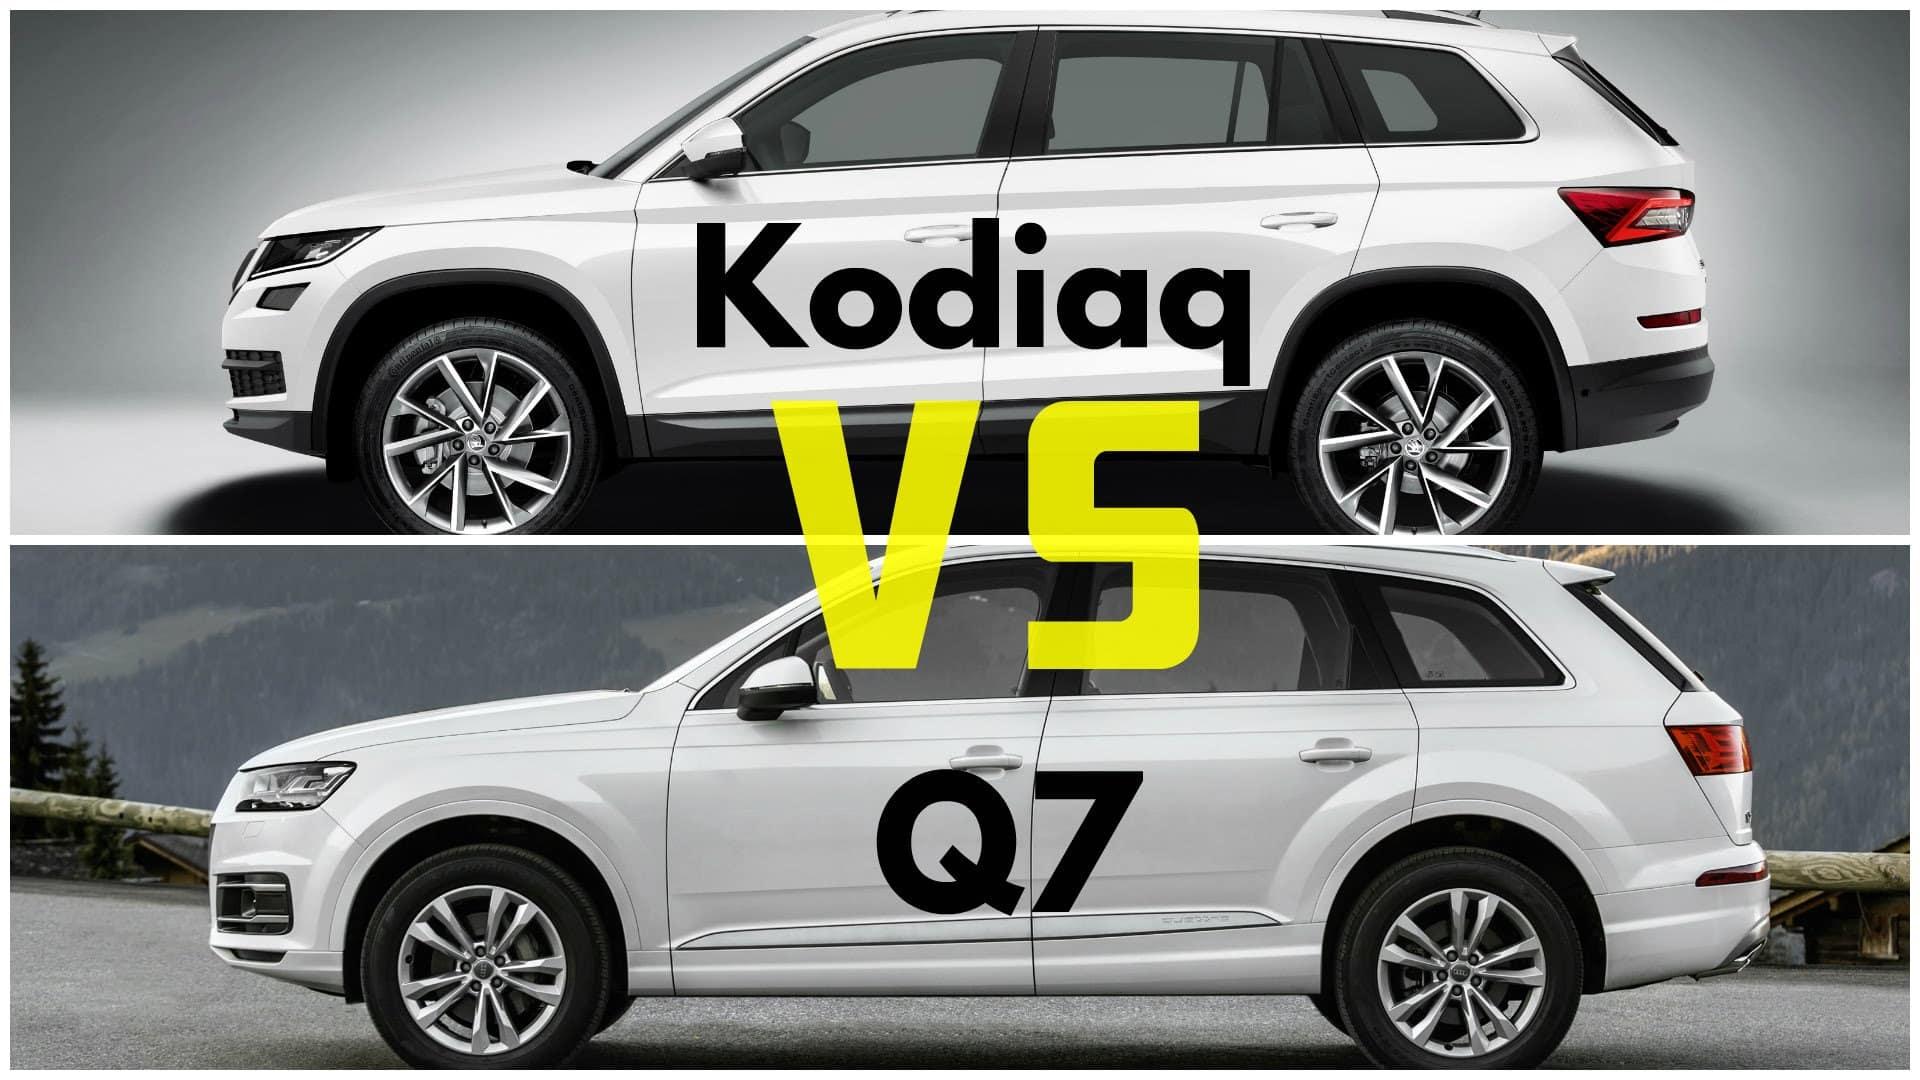 Srovnán Åkoda Koidaq vs Audi Q7